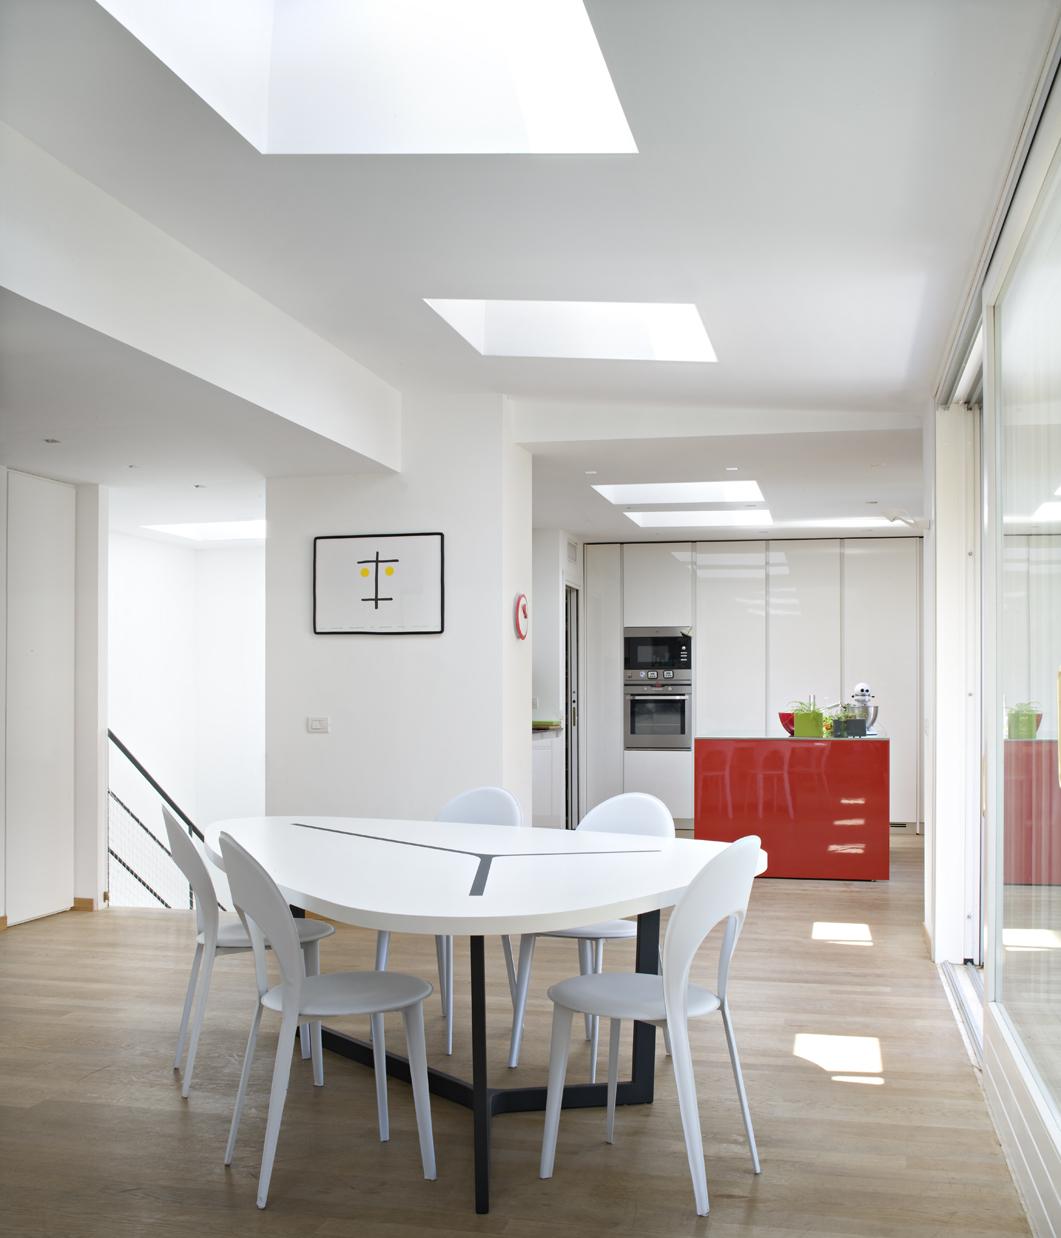 Illuminazione Cucina Open Space: In un open space la cucina deve essere a vista scopri con noi ...